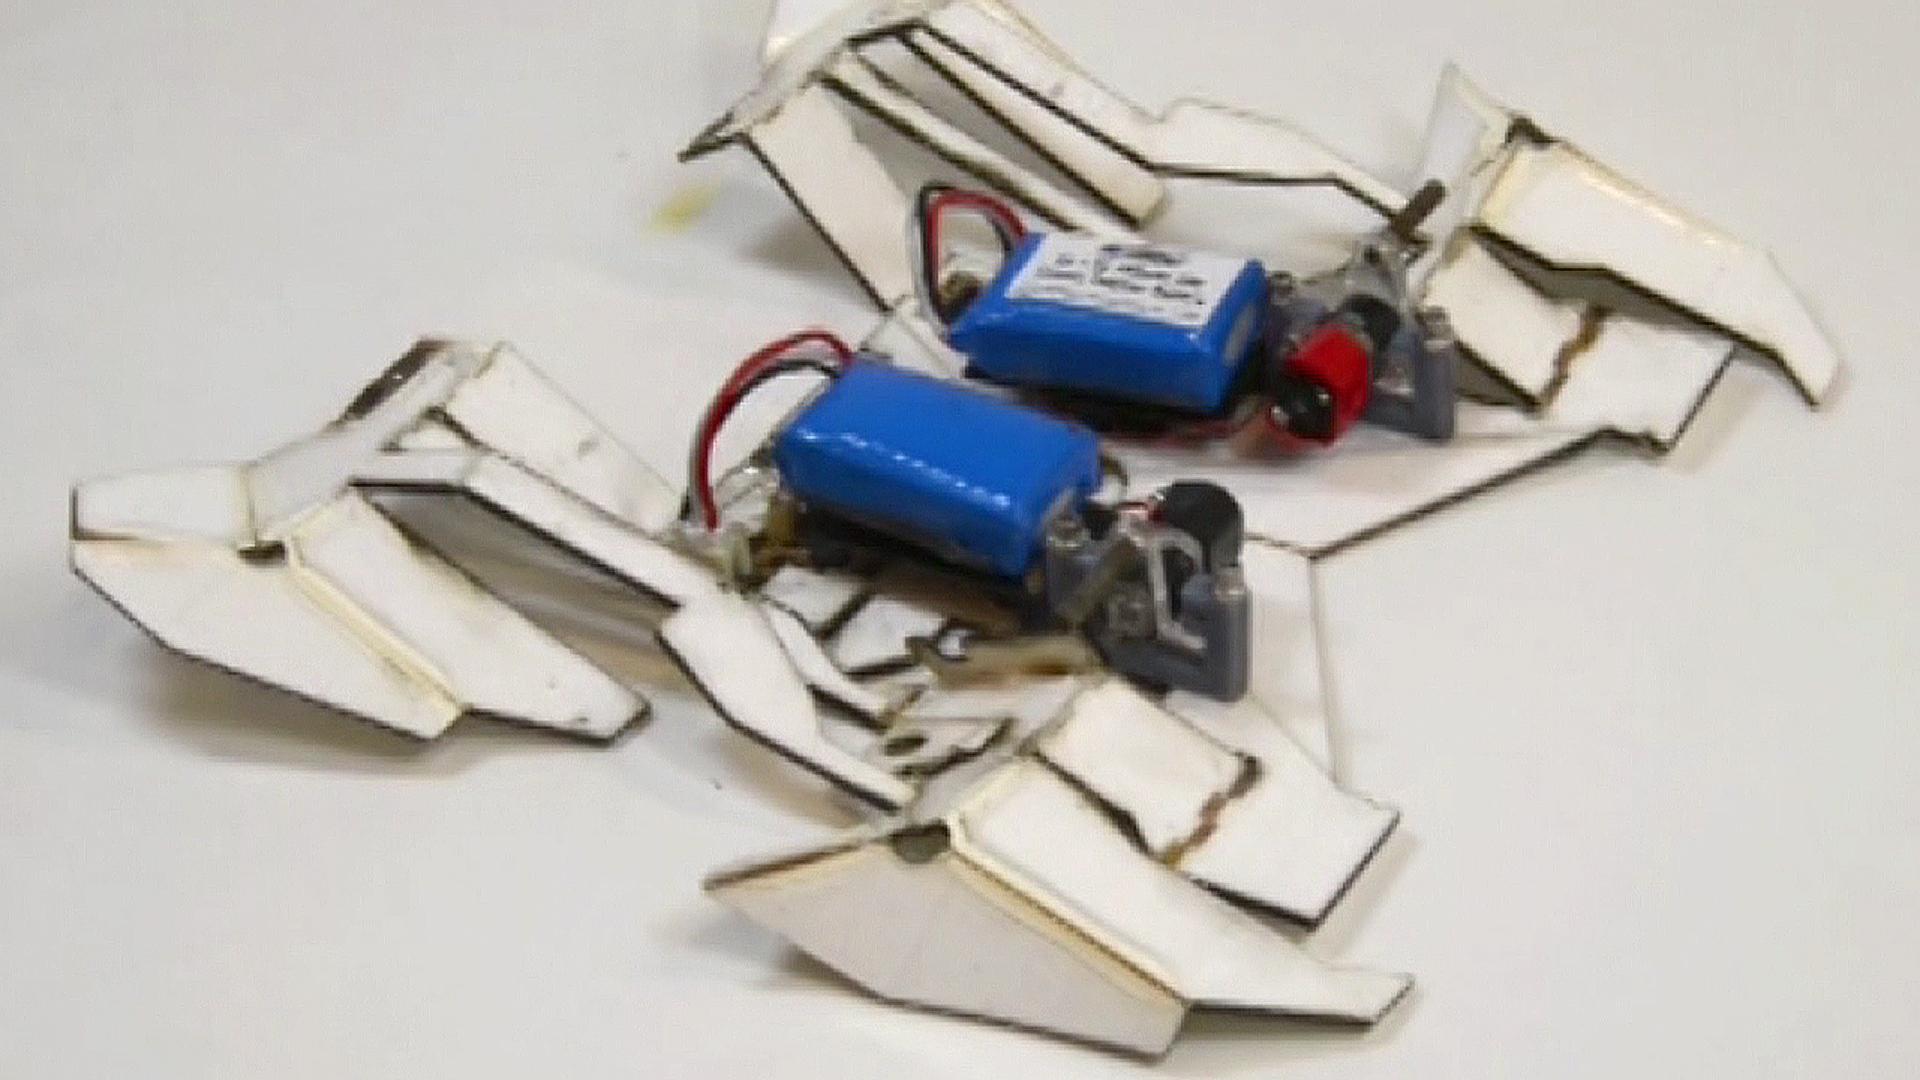 Botmakers unite origami robots could start transformer origami robots could start transformer revolution nbc news jeuxipadfo Images